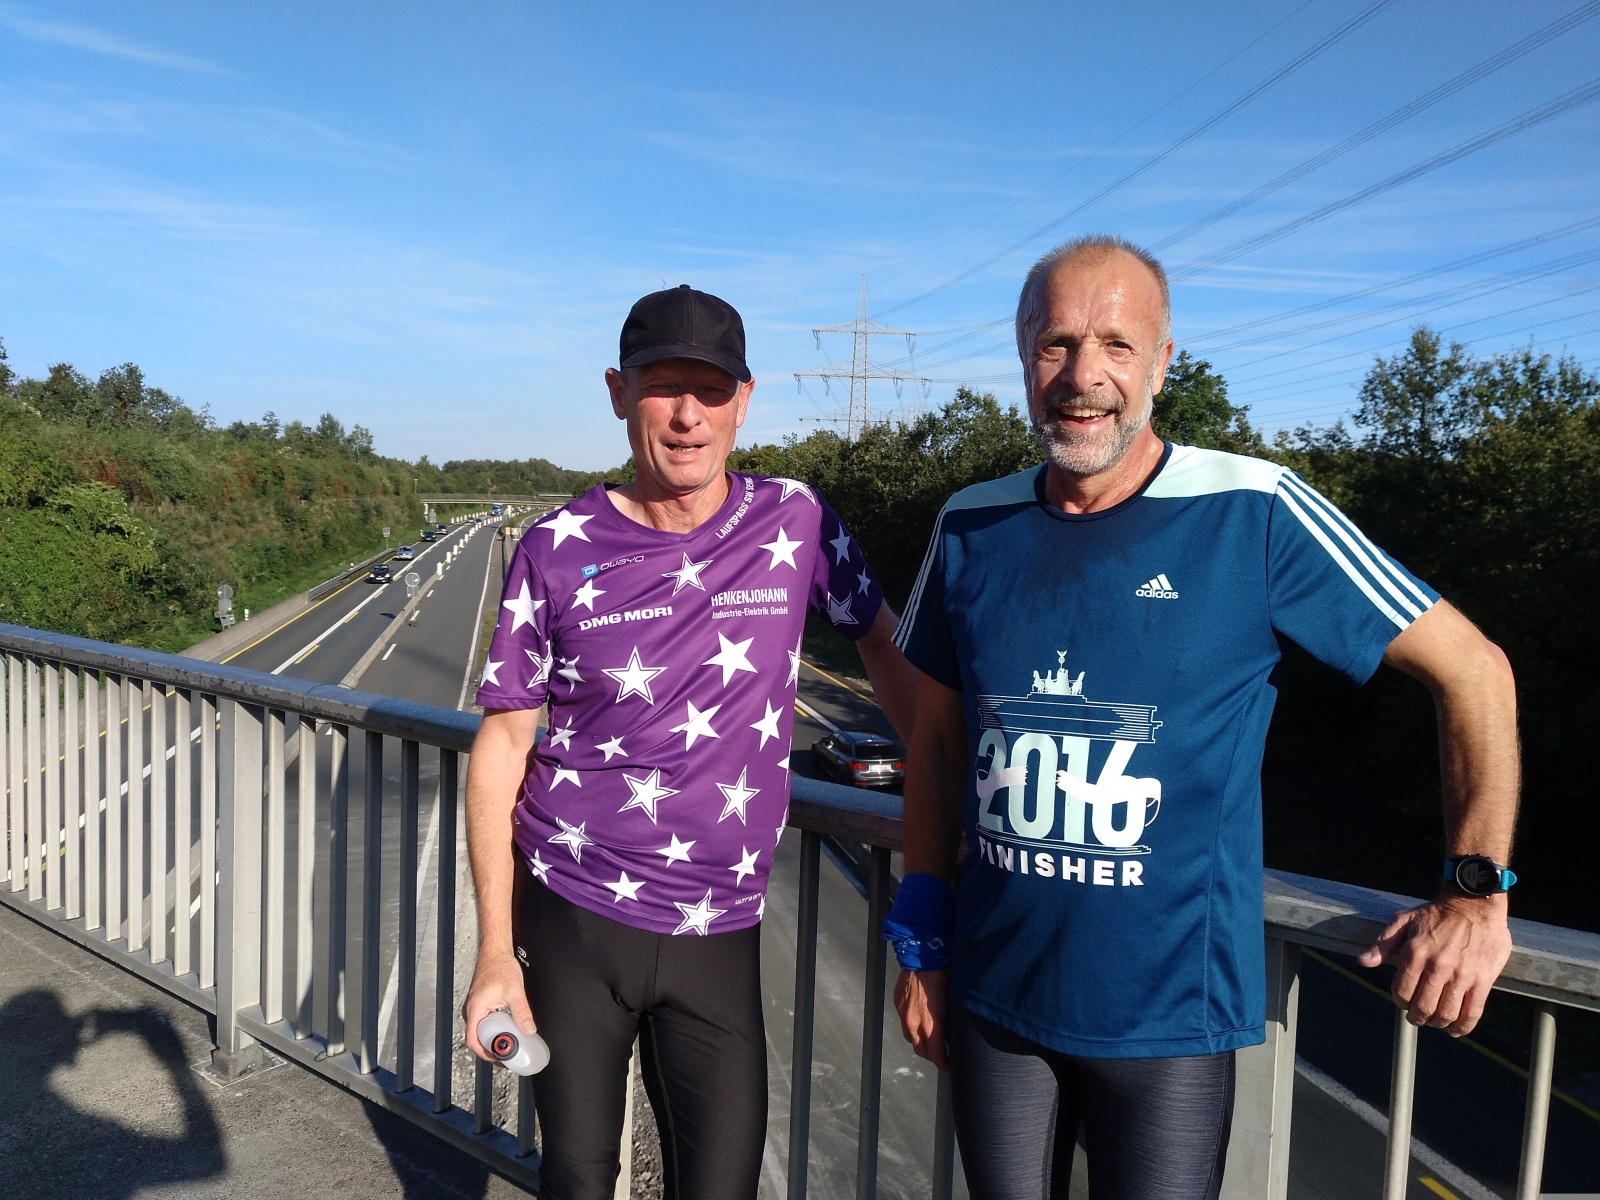 Just-Gerd-34-Challenge-Brueckenlauf-fJWtX